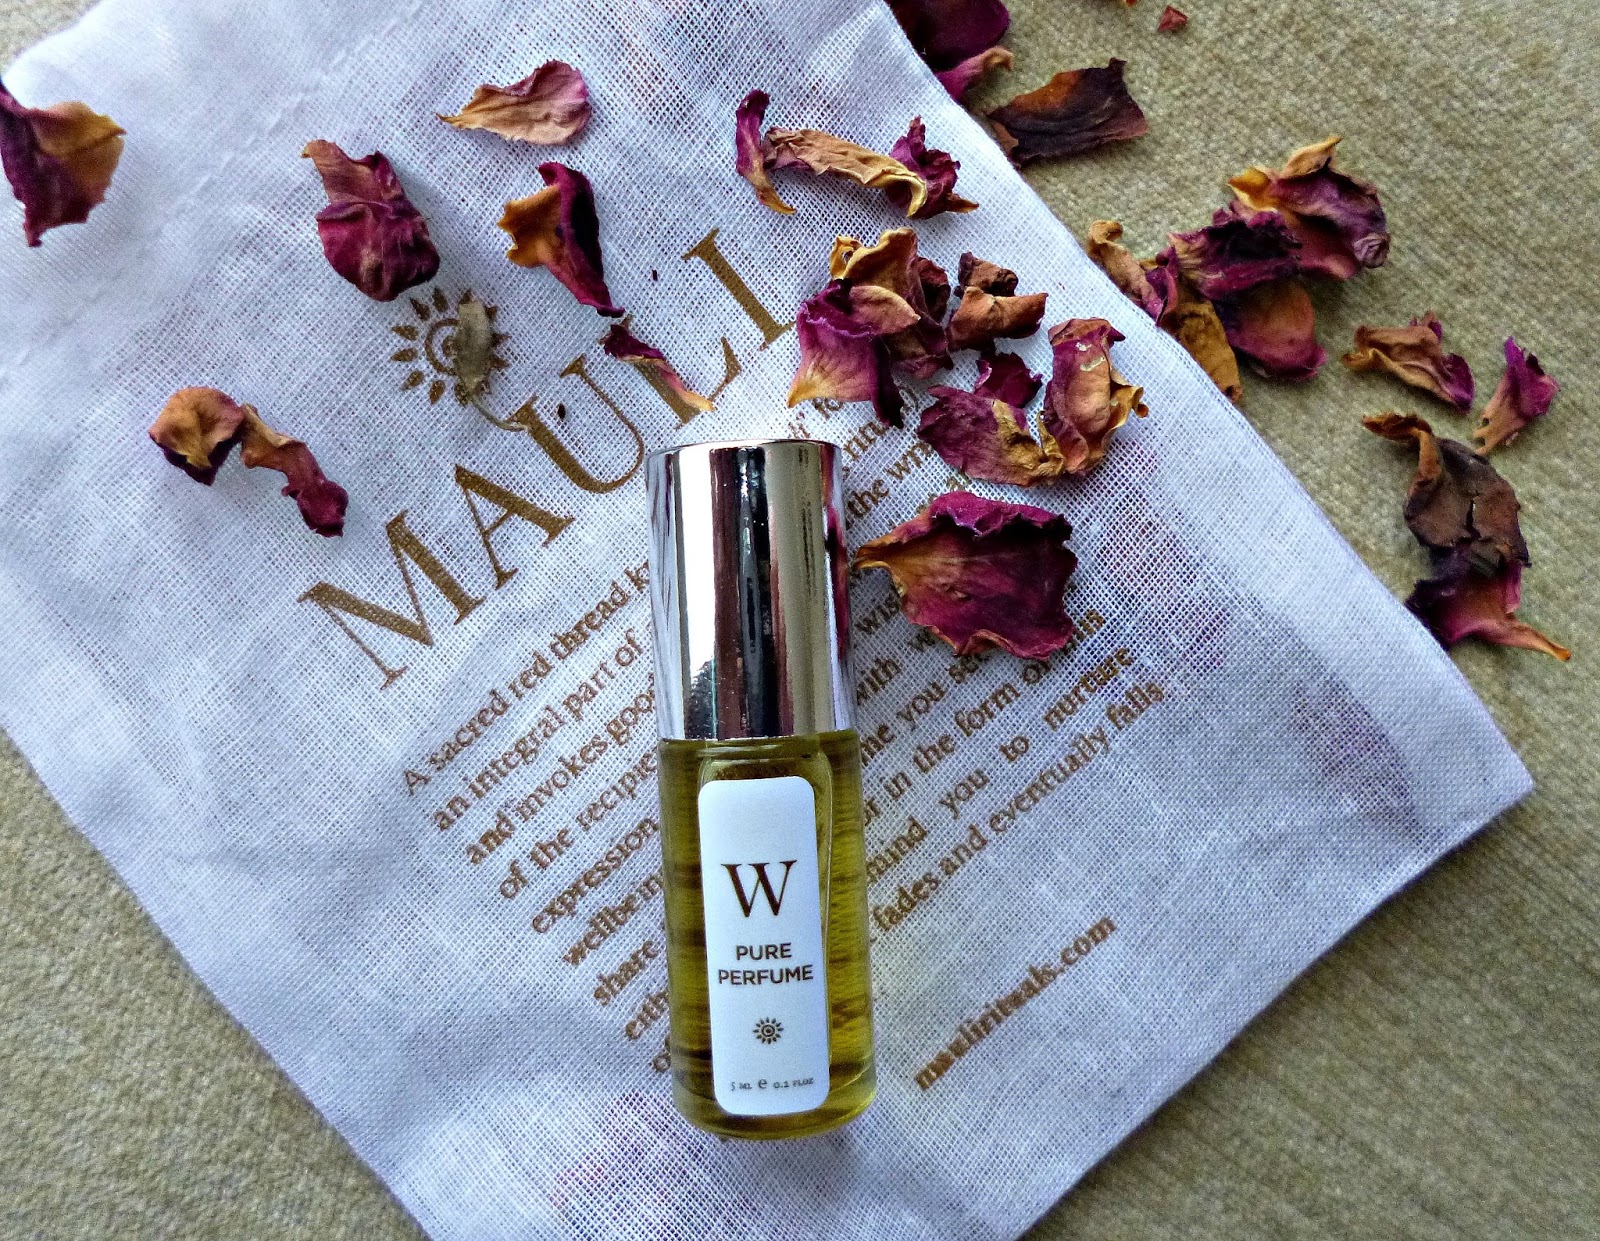 Exotic beauty: Mauli Rituals W  Pure perfume oil - Ana Green